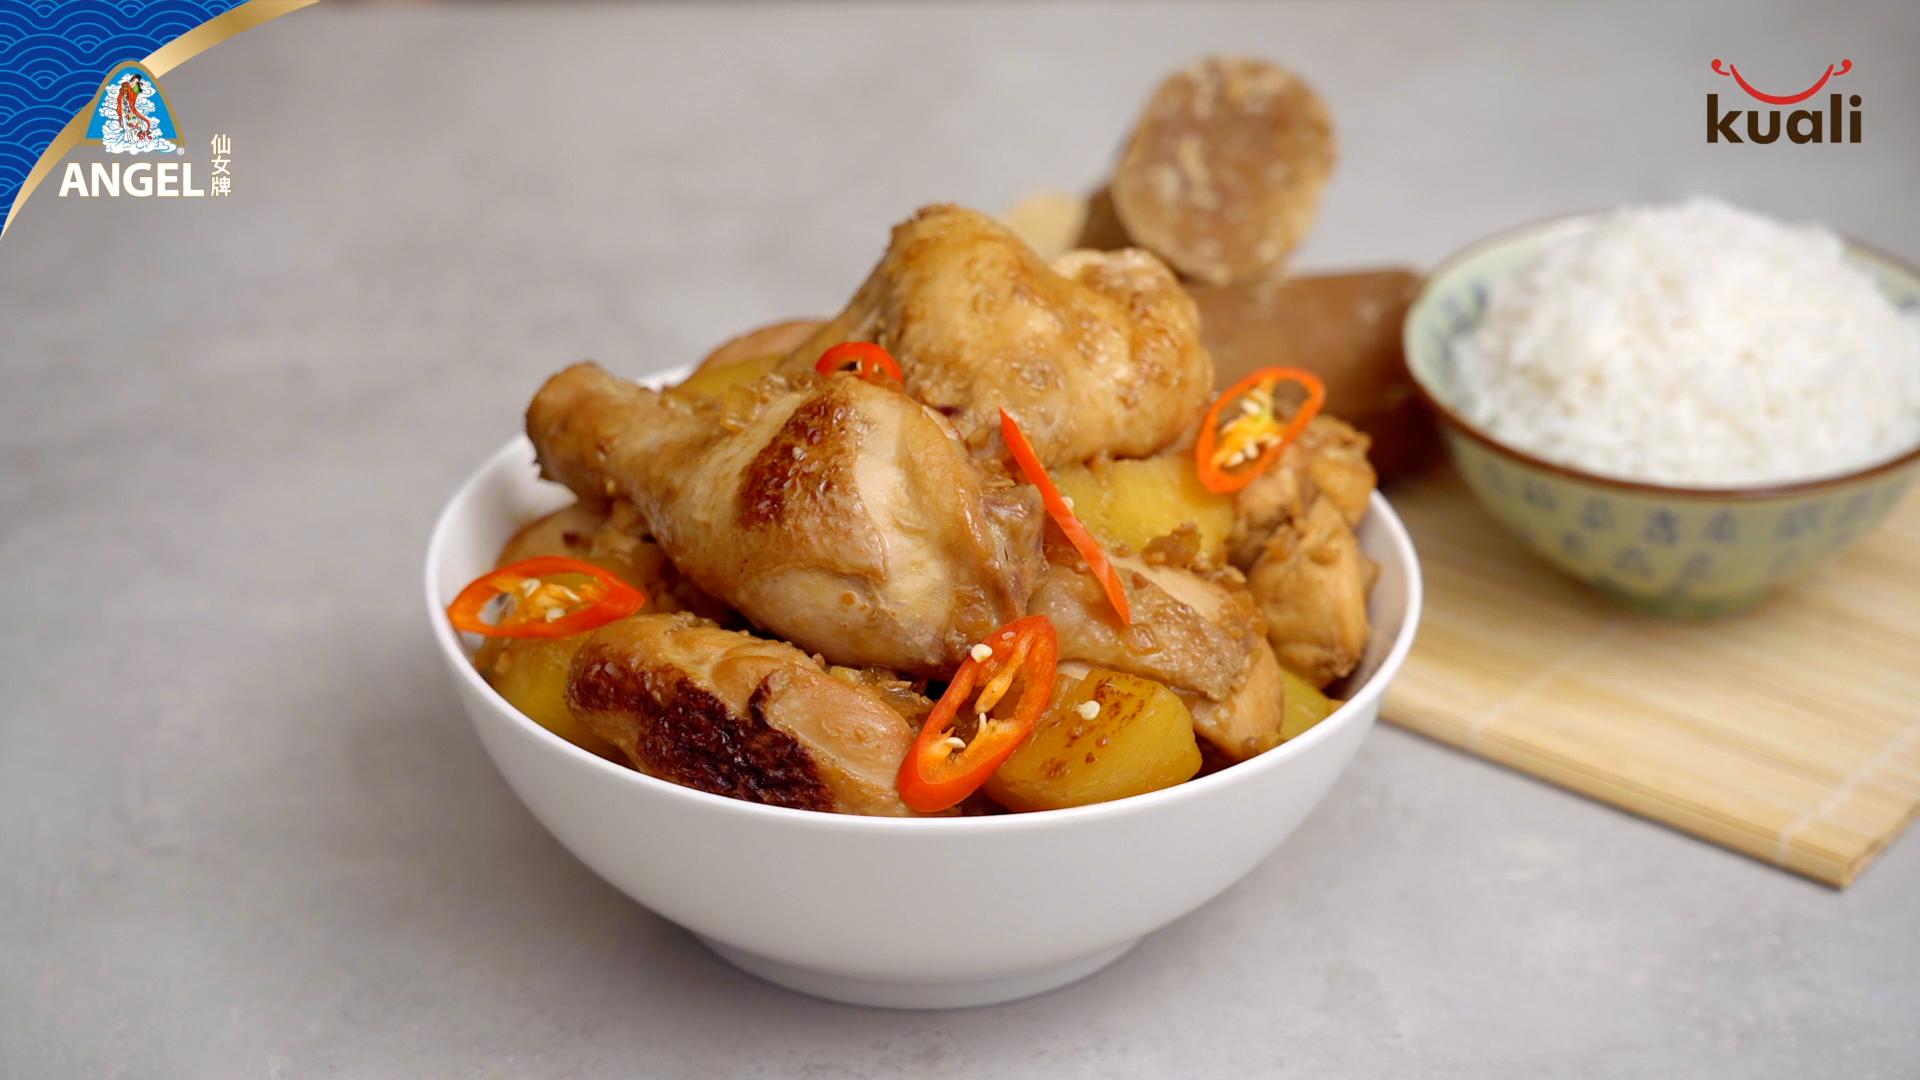 Pongteh-Chicken-1920-x-1080